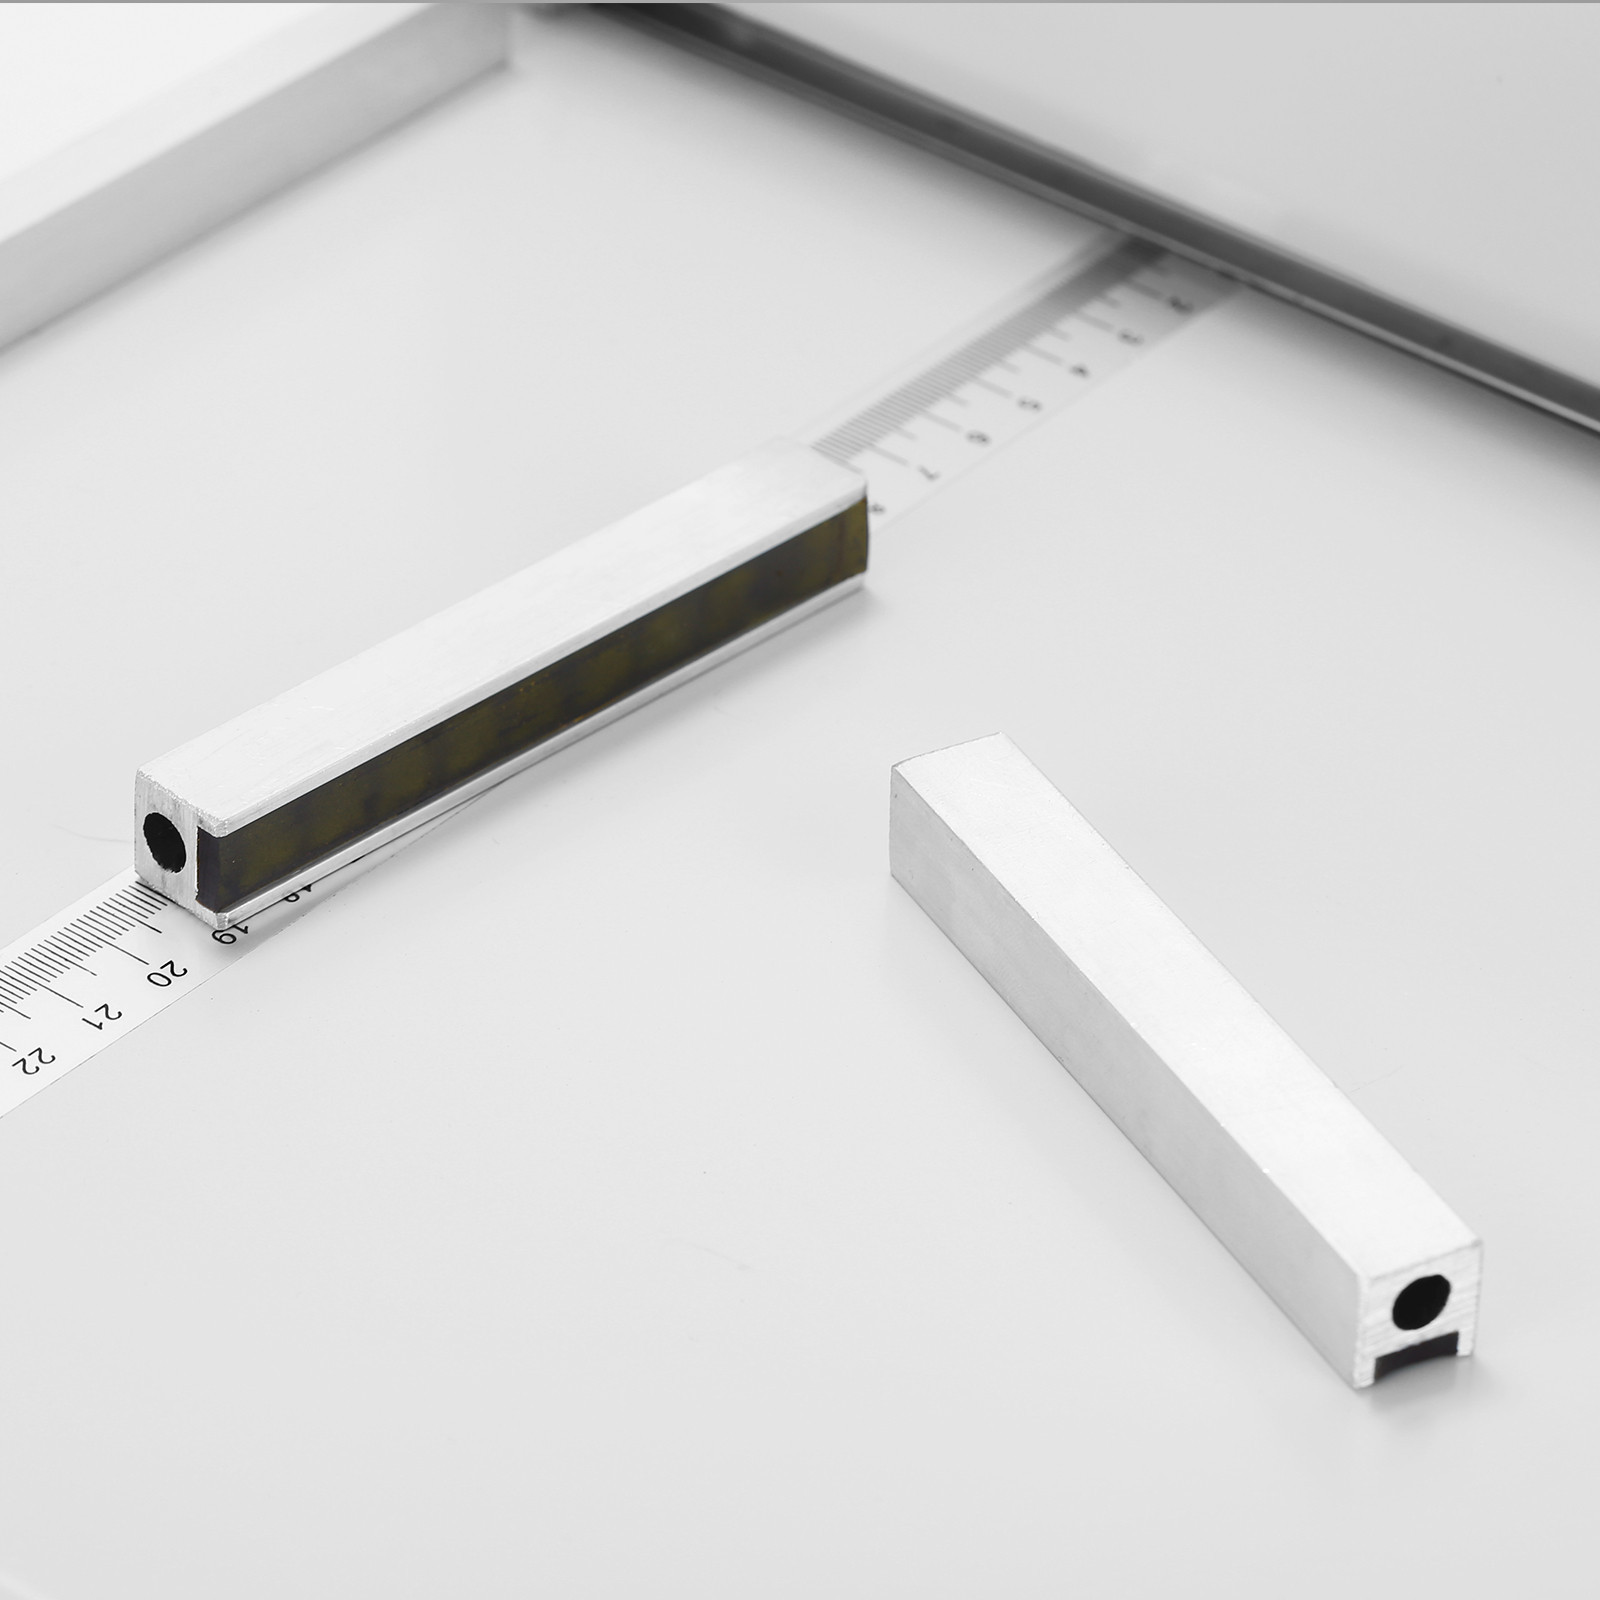 Cordonatrice-Perforatrice-Max-350-520mm-Profondita-Regolabile-Elettrica-Manuale miniatura 45